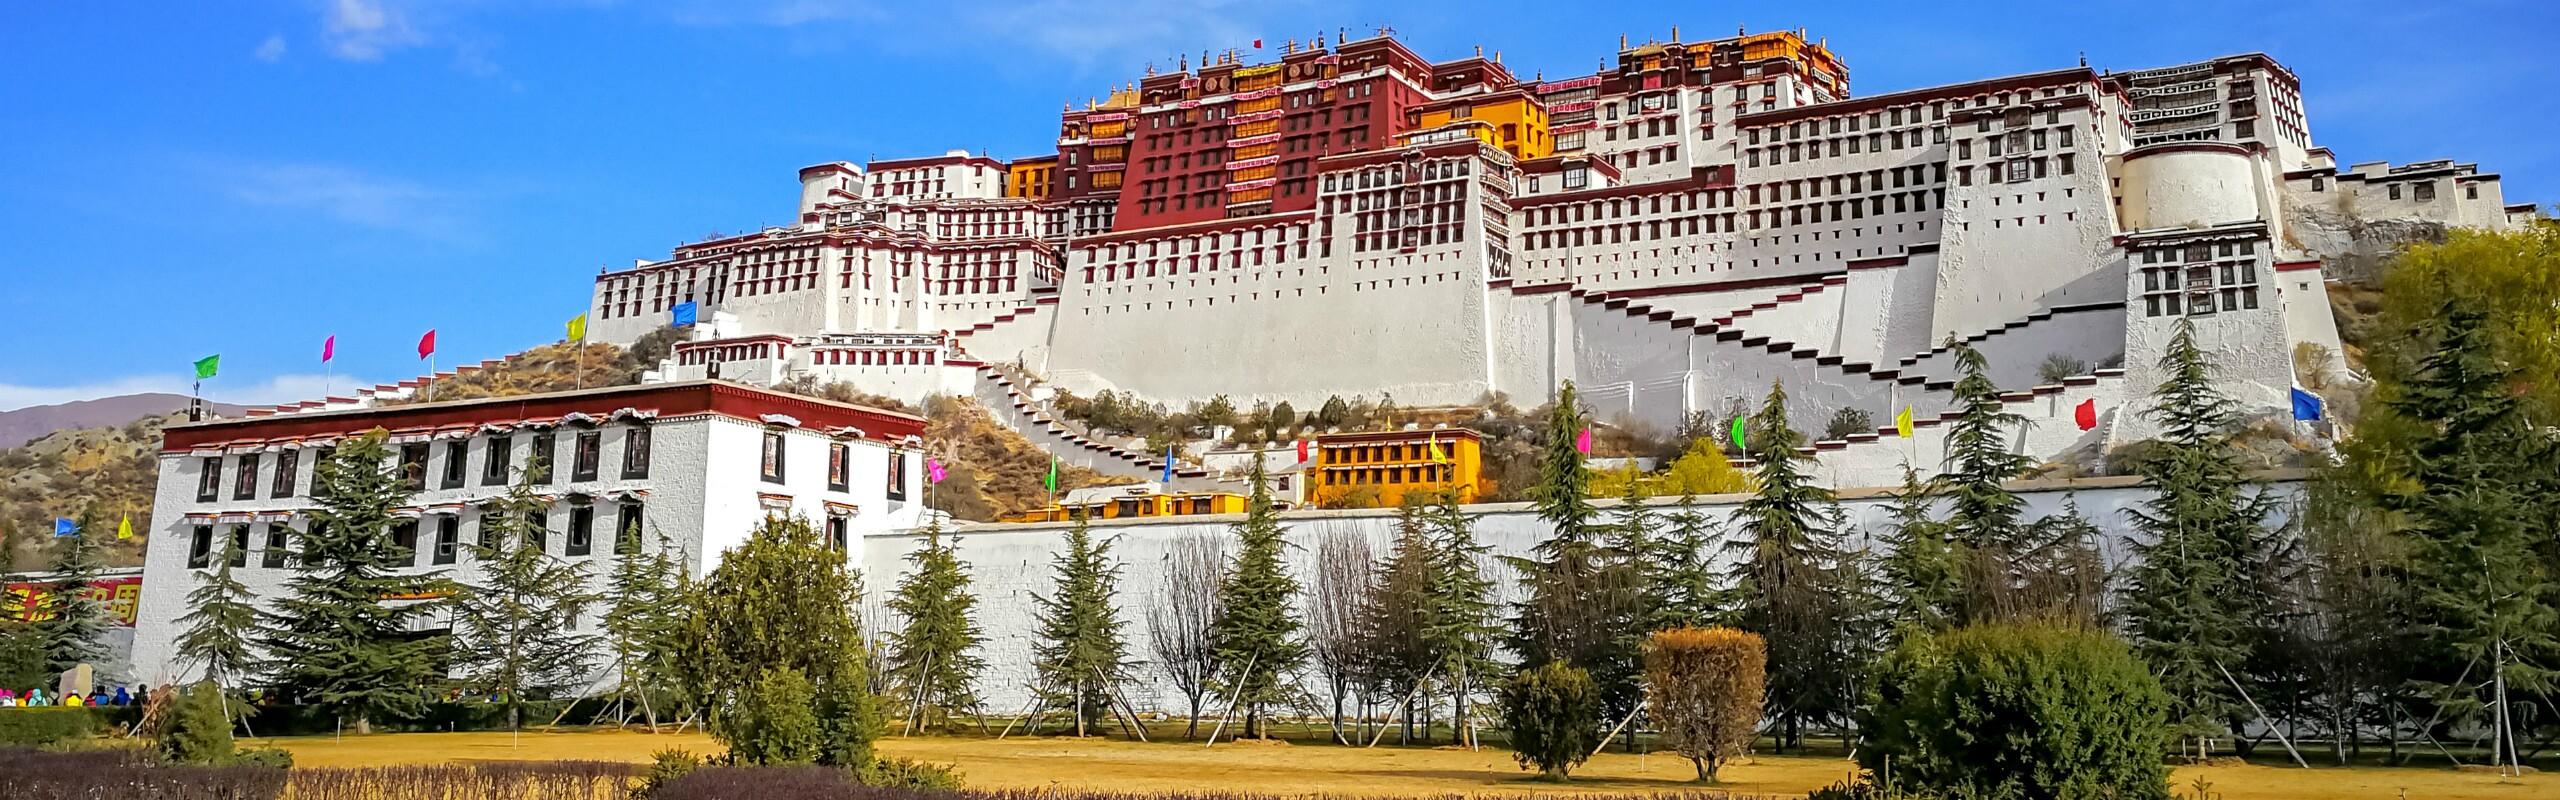 8 Days Chengdu Pandas, Sichuan Cuisine and Lhasa Tibetan culture Tour